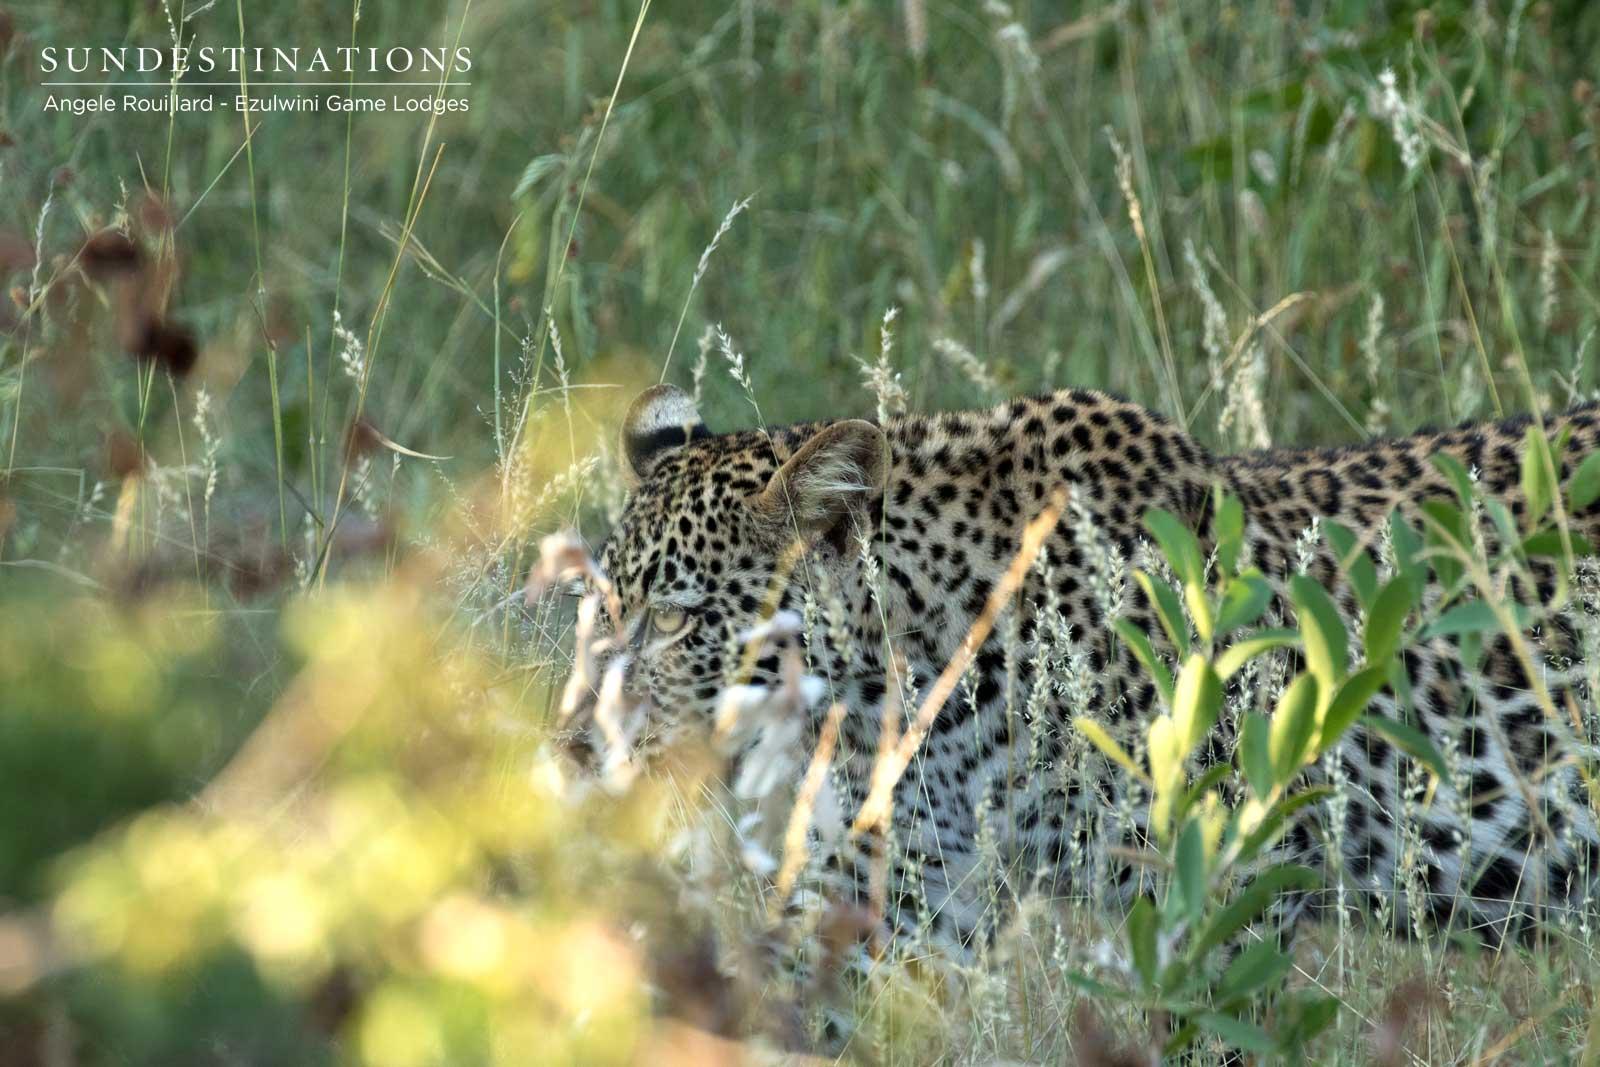 Leopard Cub at Ezulwini